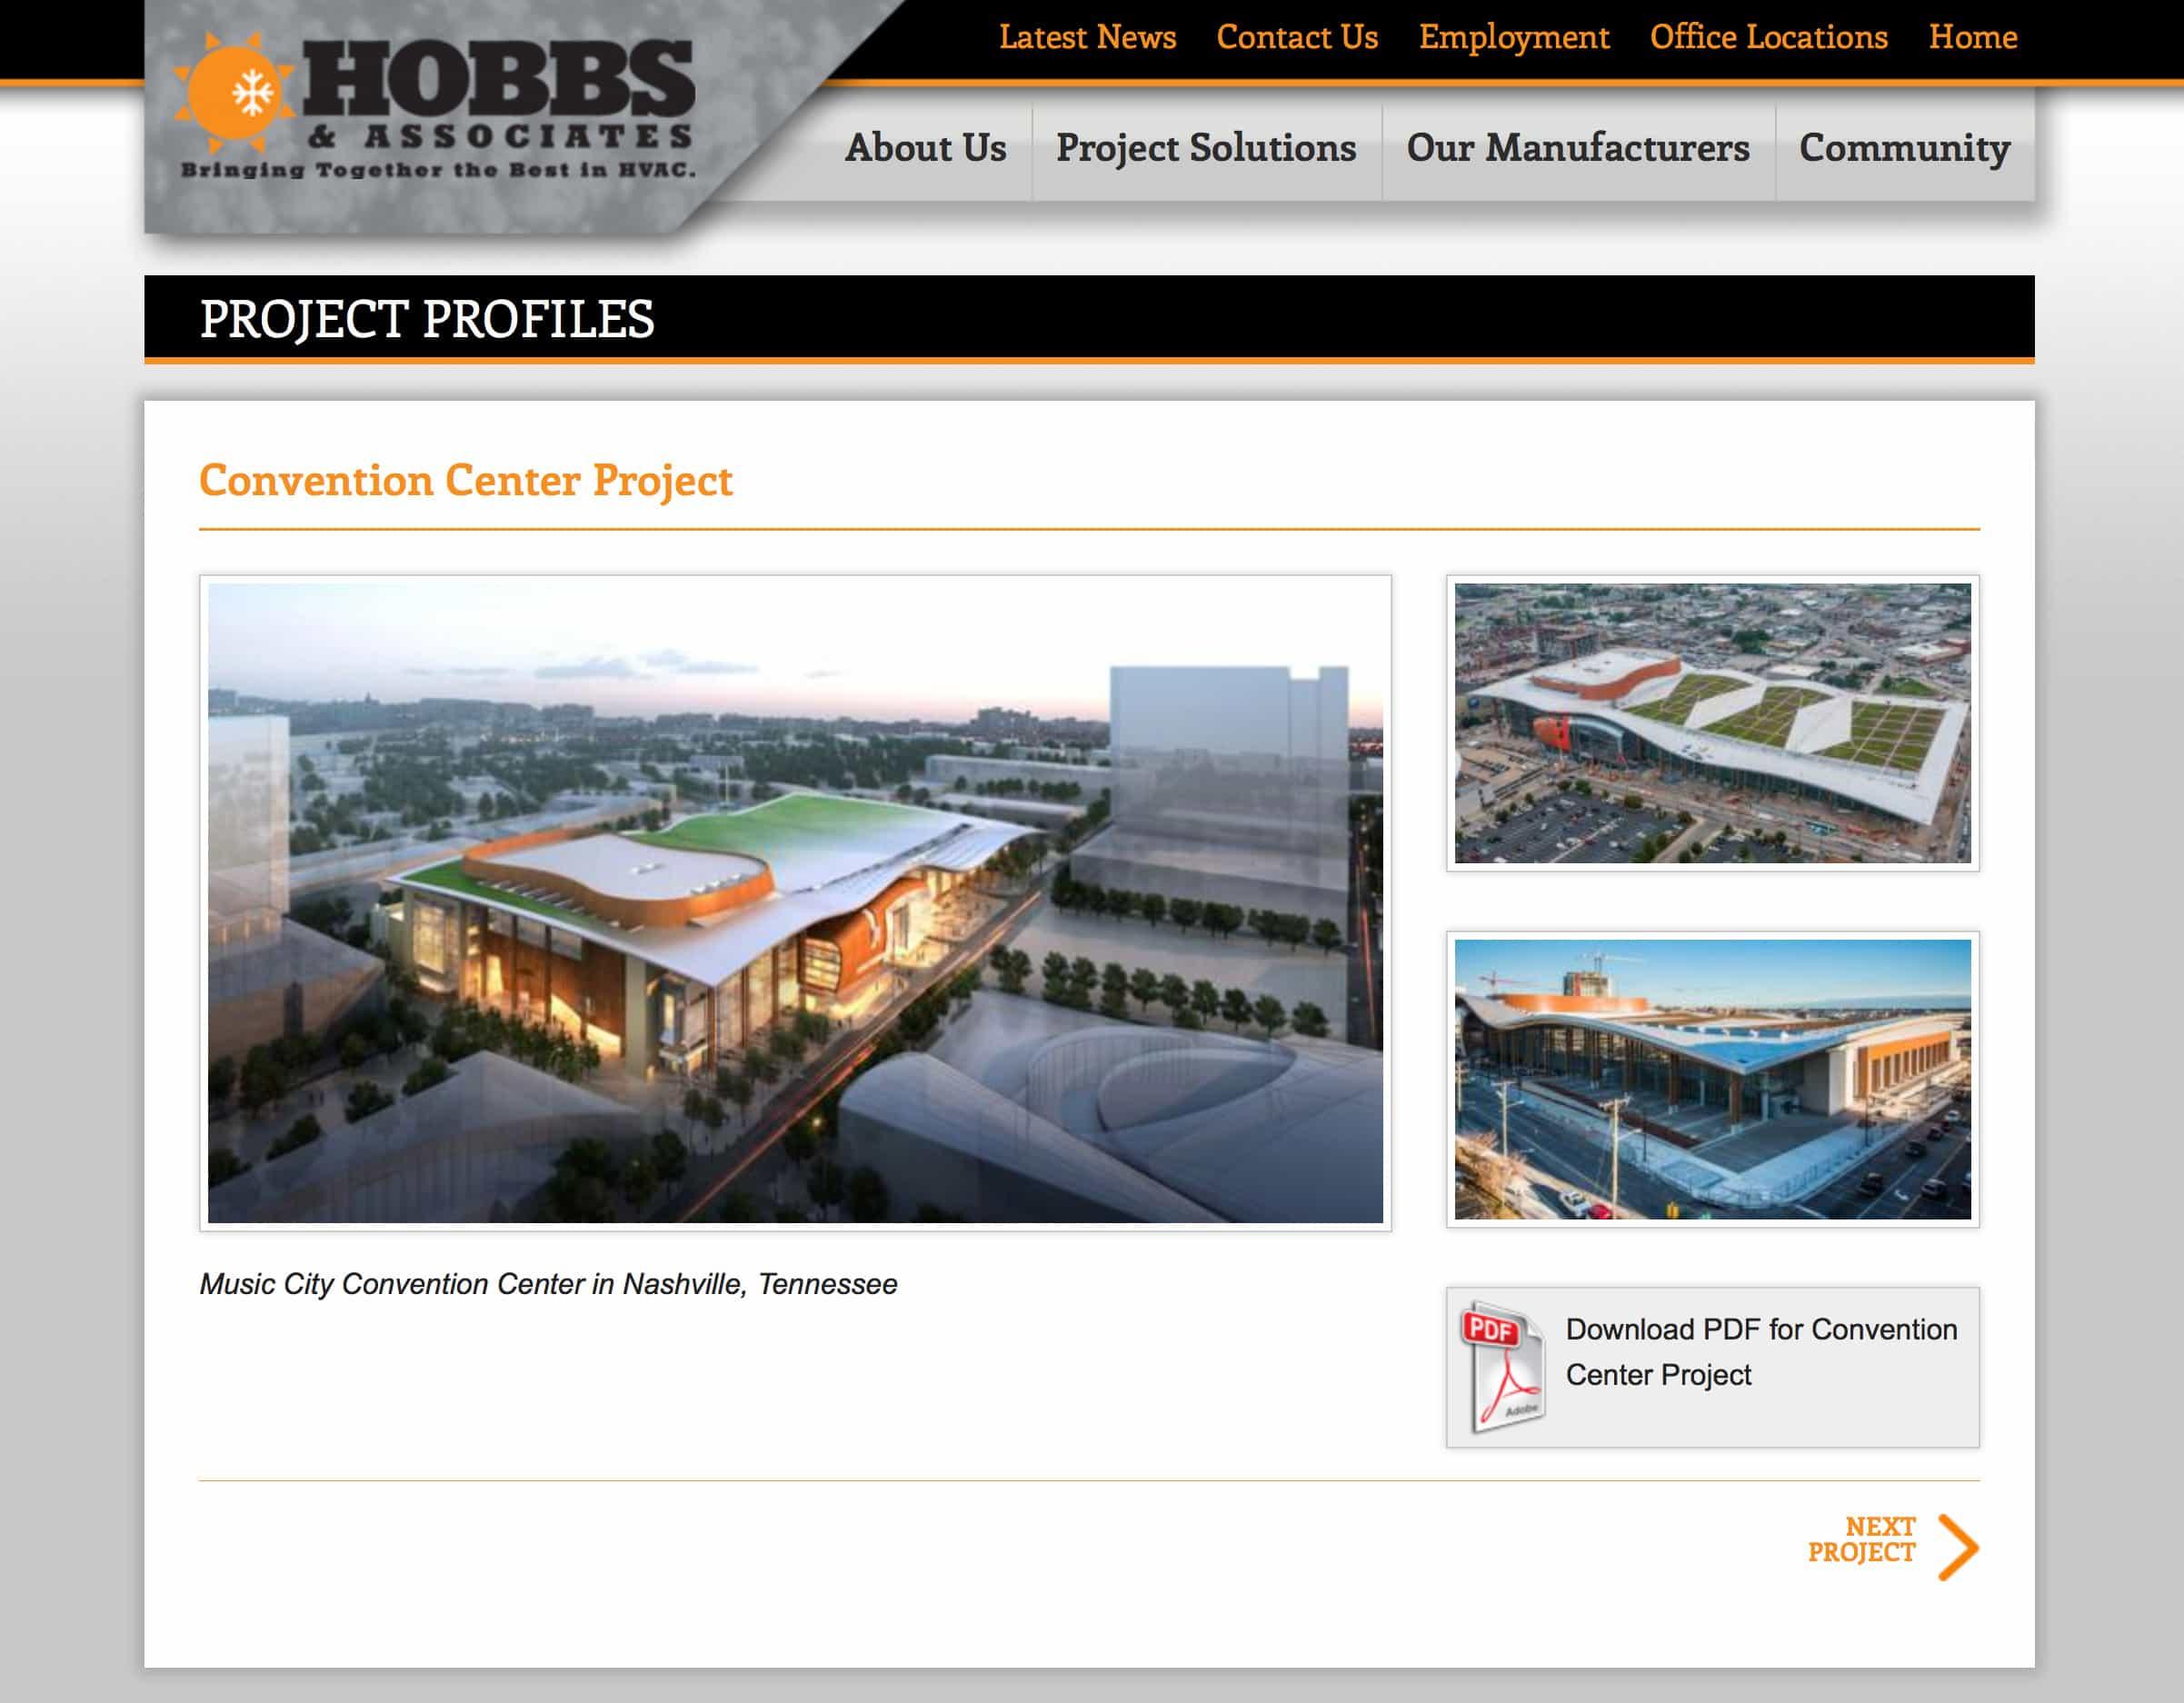 Hobbs & Associates - Web Design